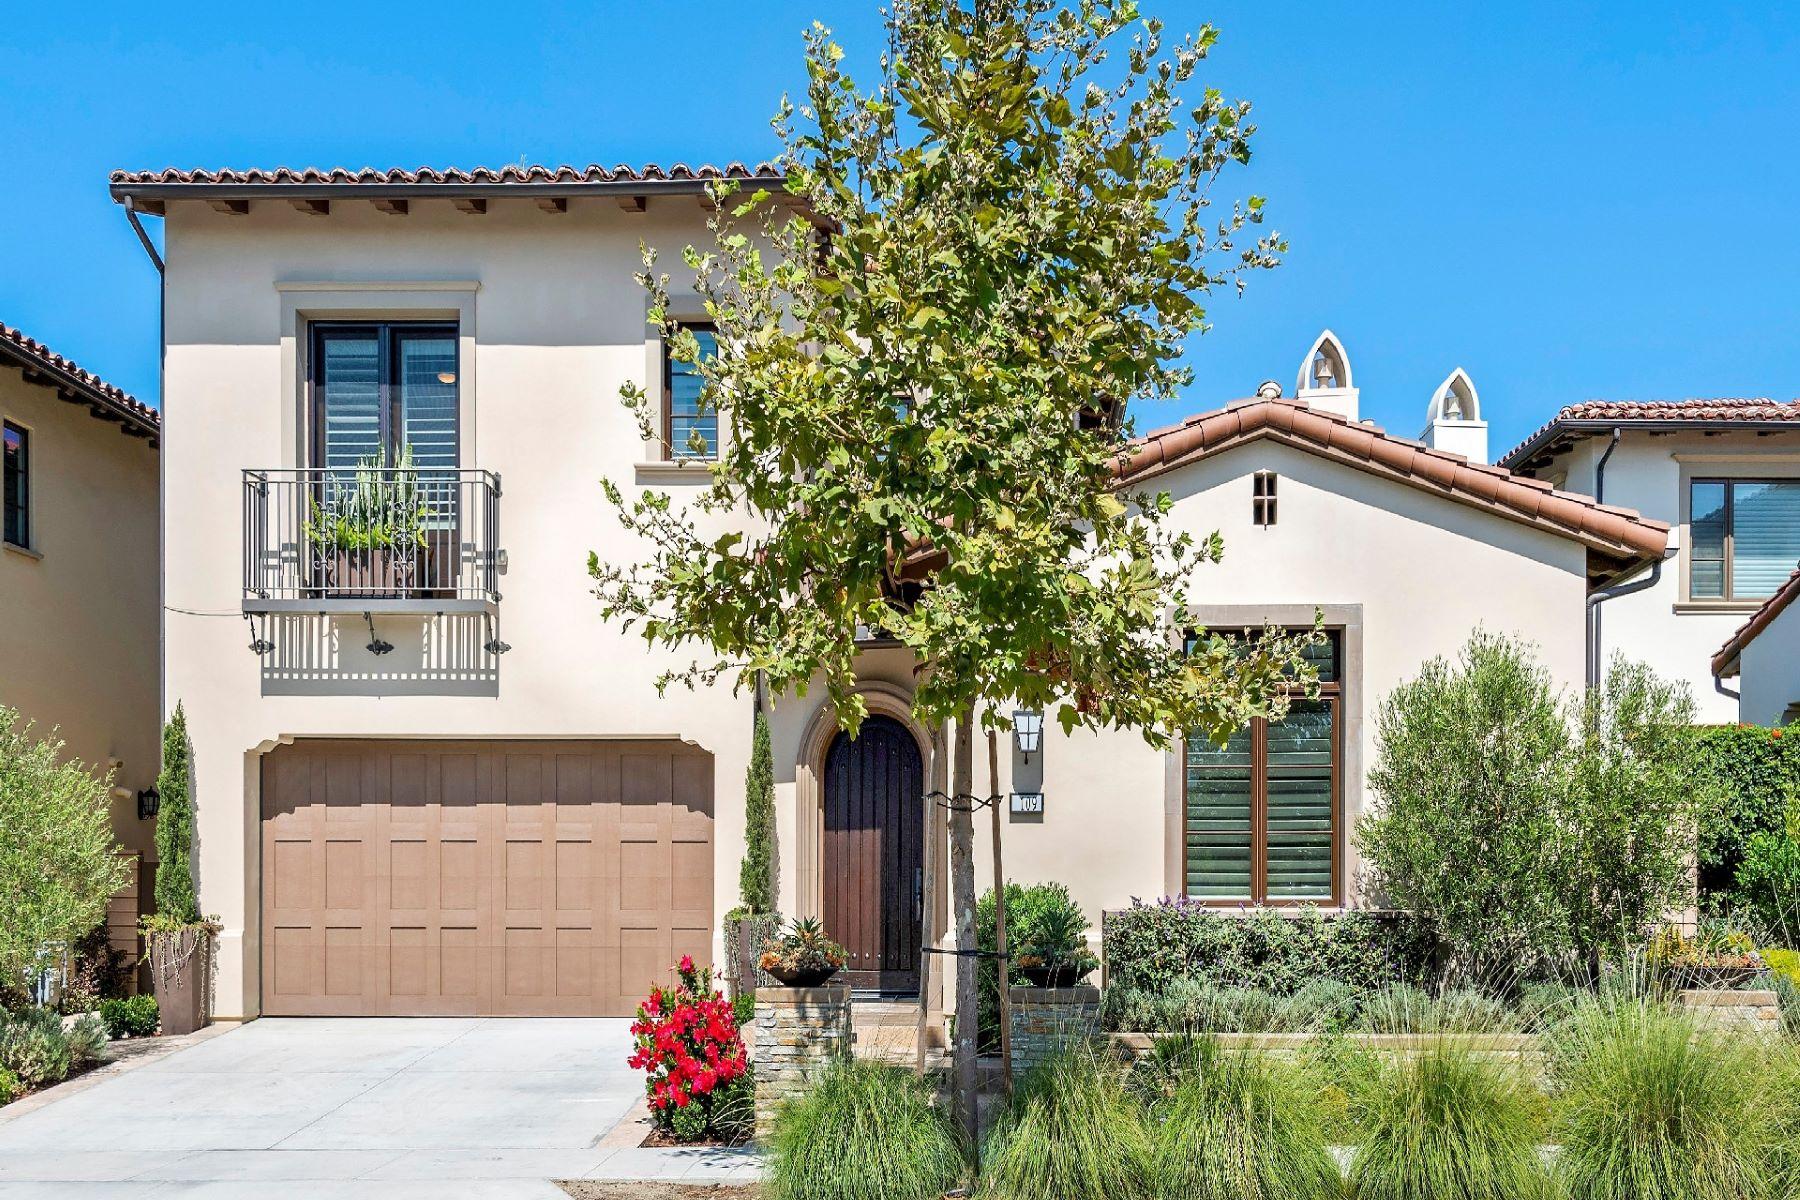 Single Family Homes for Sale at 109 Via Bellas Artes 109 Via Bellas Artes San Clemente, California 92672 United States